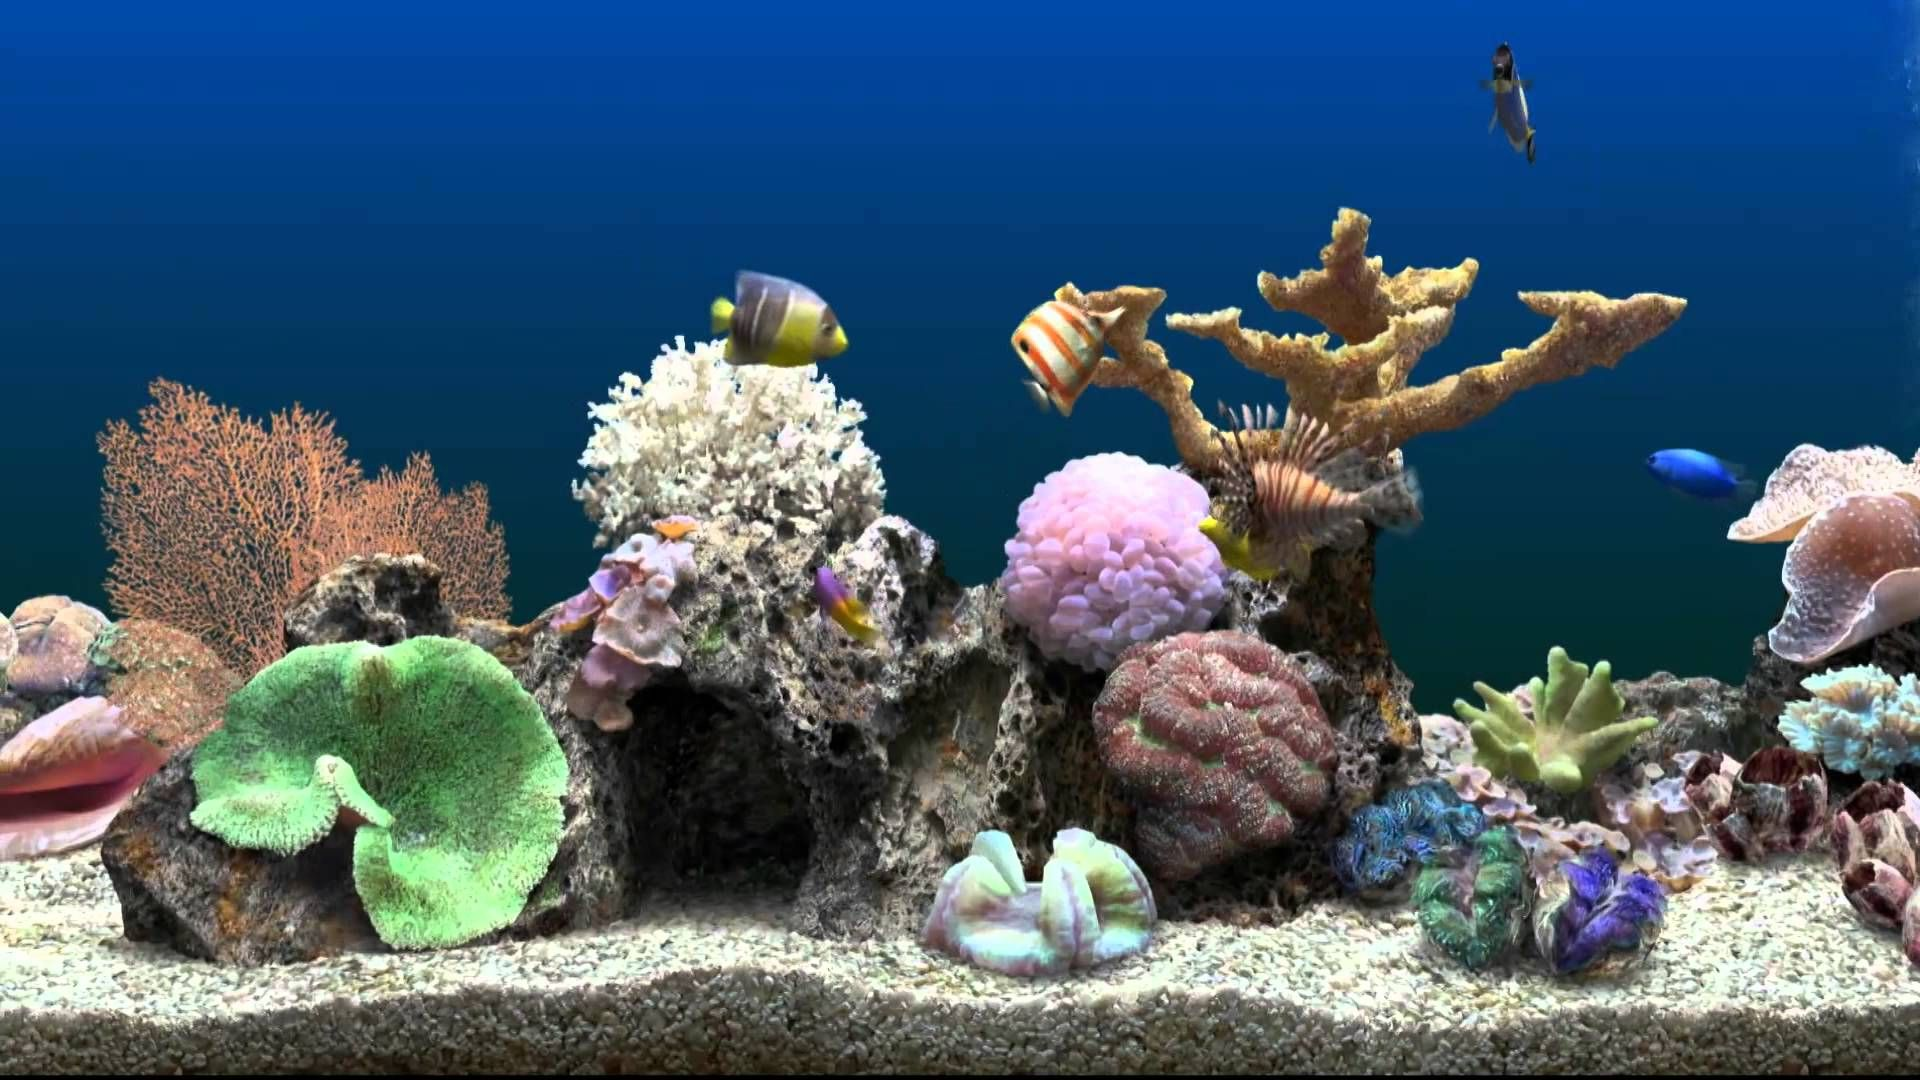 d0149168afbb616ff4cfddd35dfd0e8d Frais De Aquarium Tropical Schème